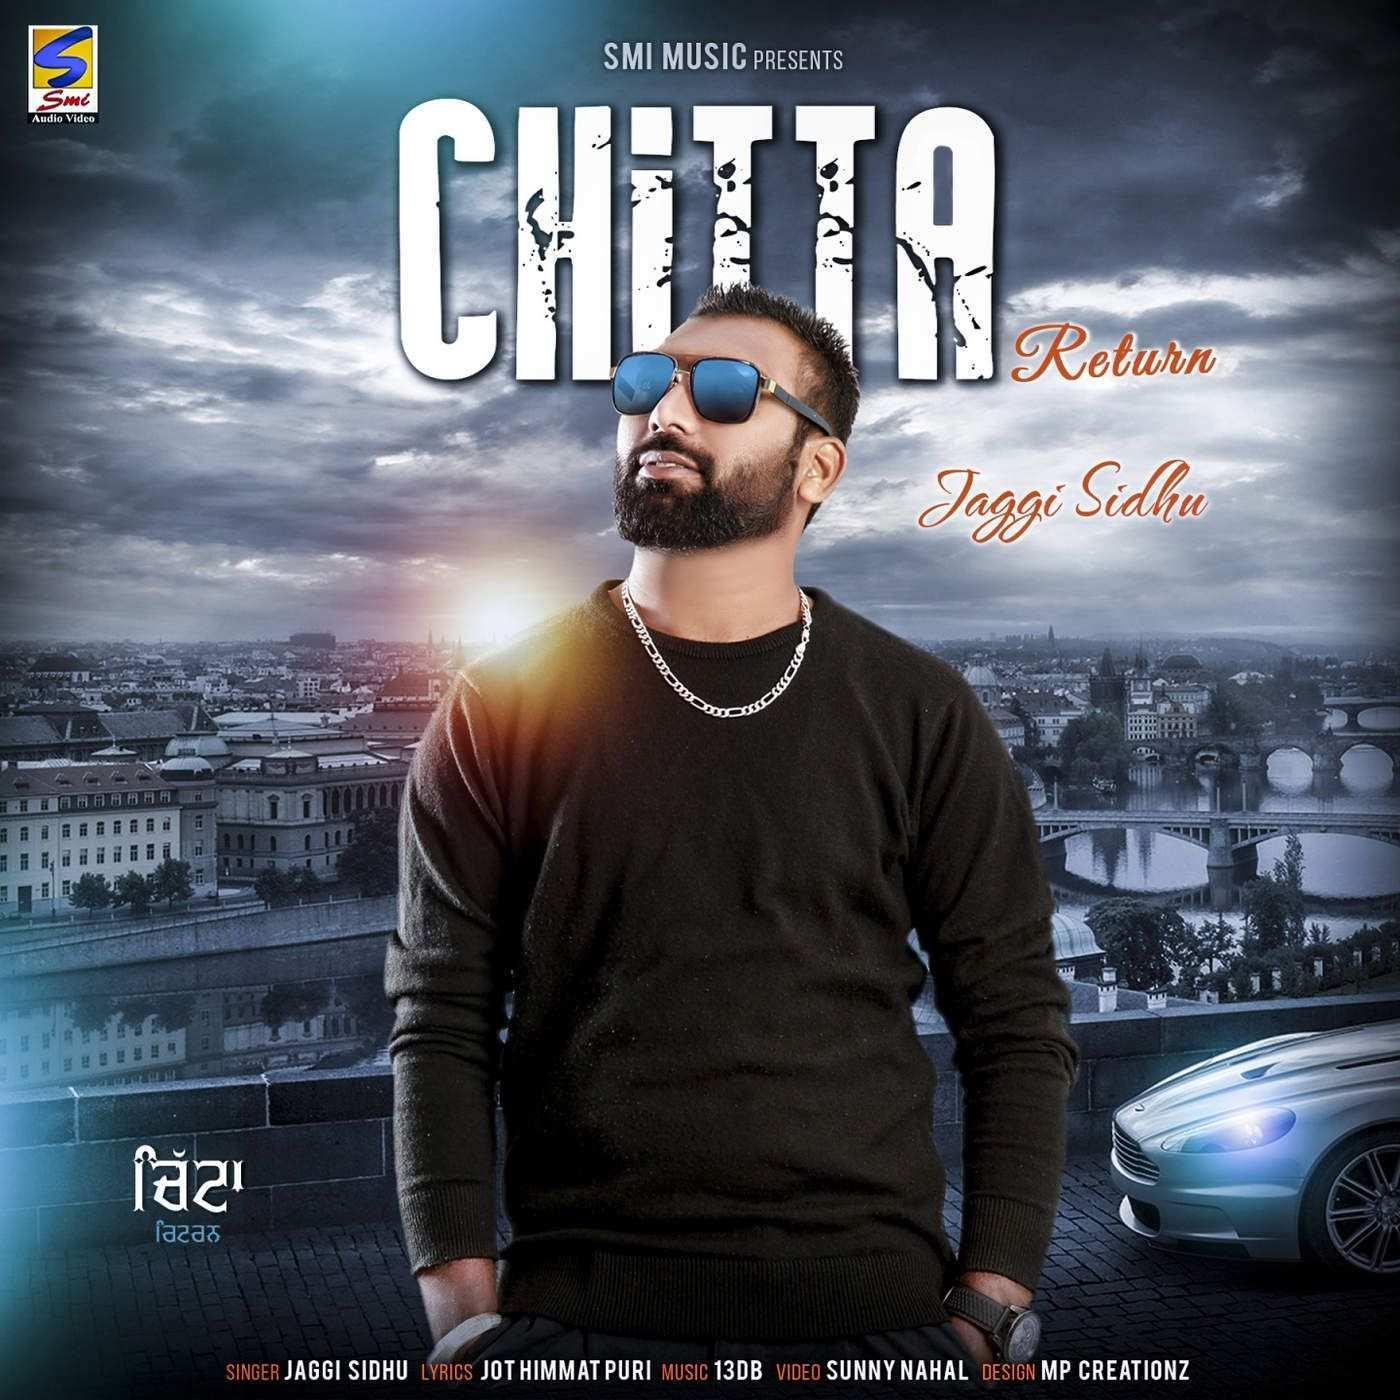 Chitta Return Jaggi Sidhu Mp3 Songs Dj Single Track Chitta Return Chitta Return Music 320kbps Singers Jaggi Sidhu All Songs Lyrics Chi Songs Mp3 Song Video